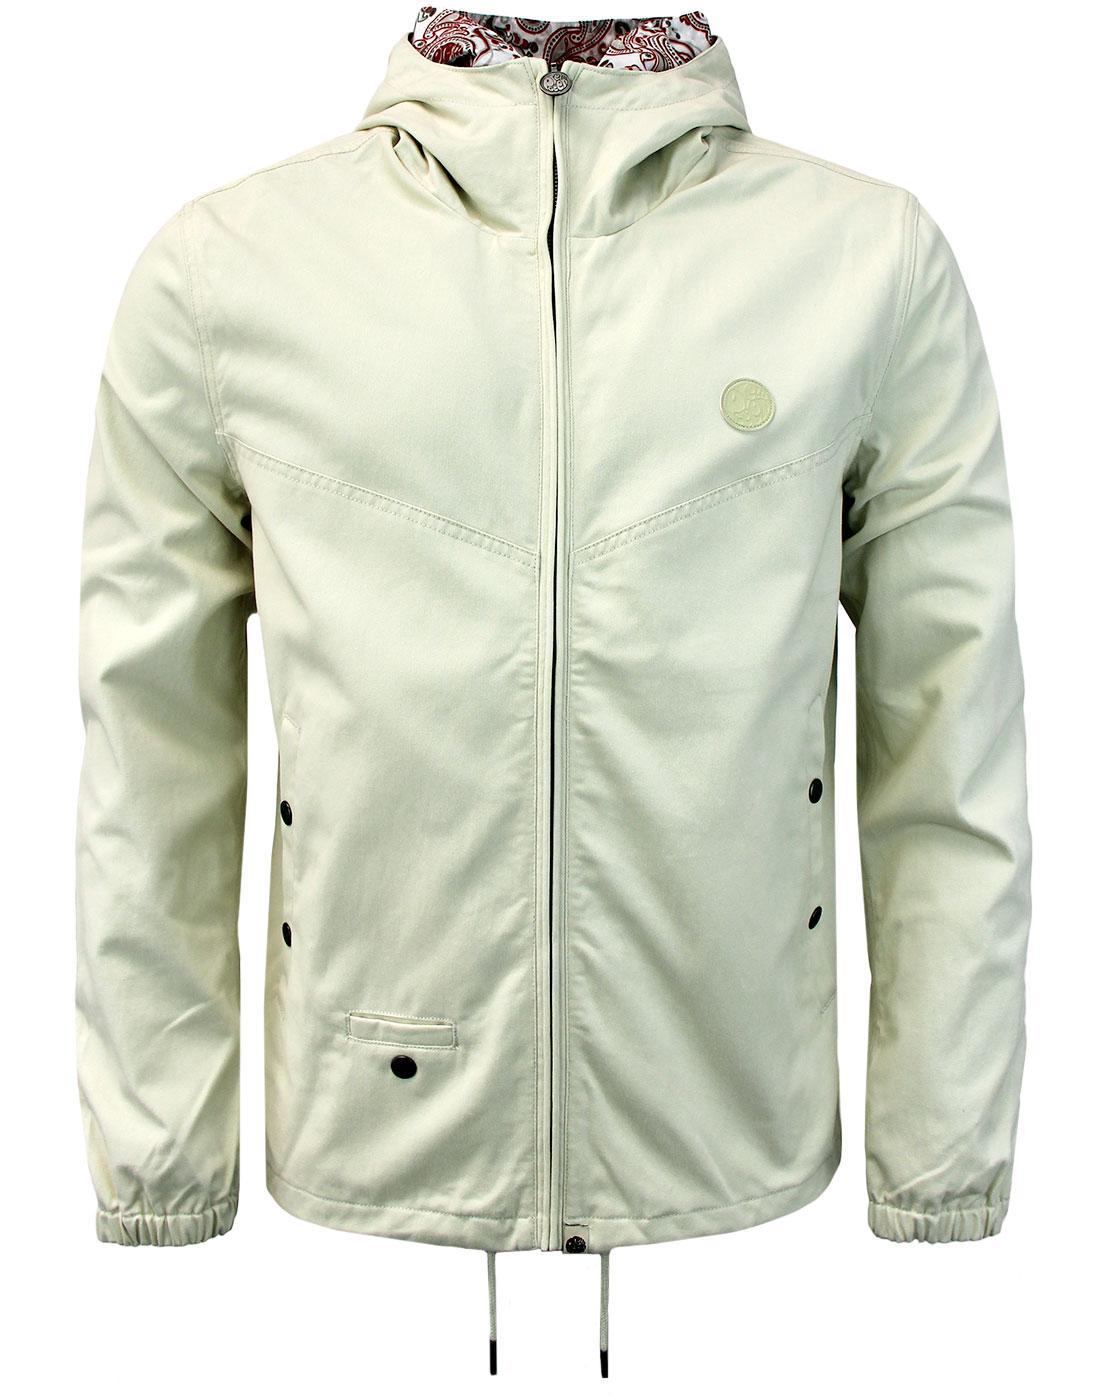 Beckford PRETTY GREEN Retro Hooded Jacket STONE